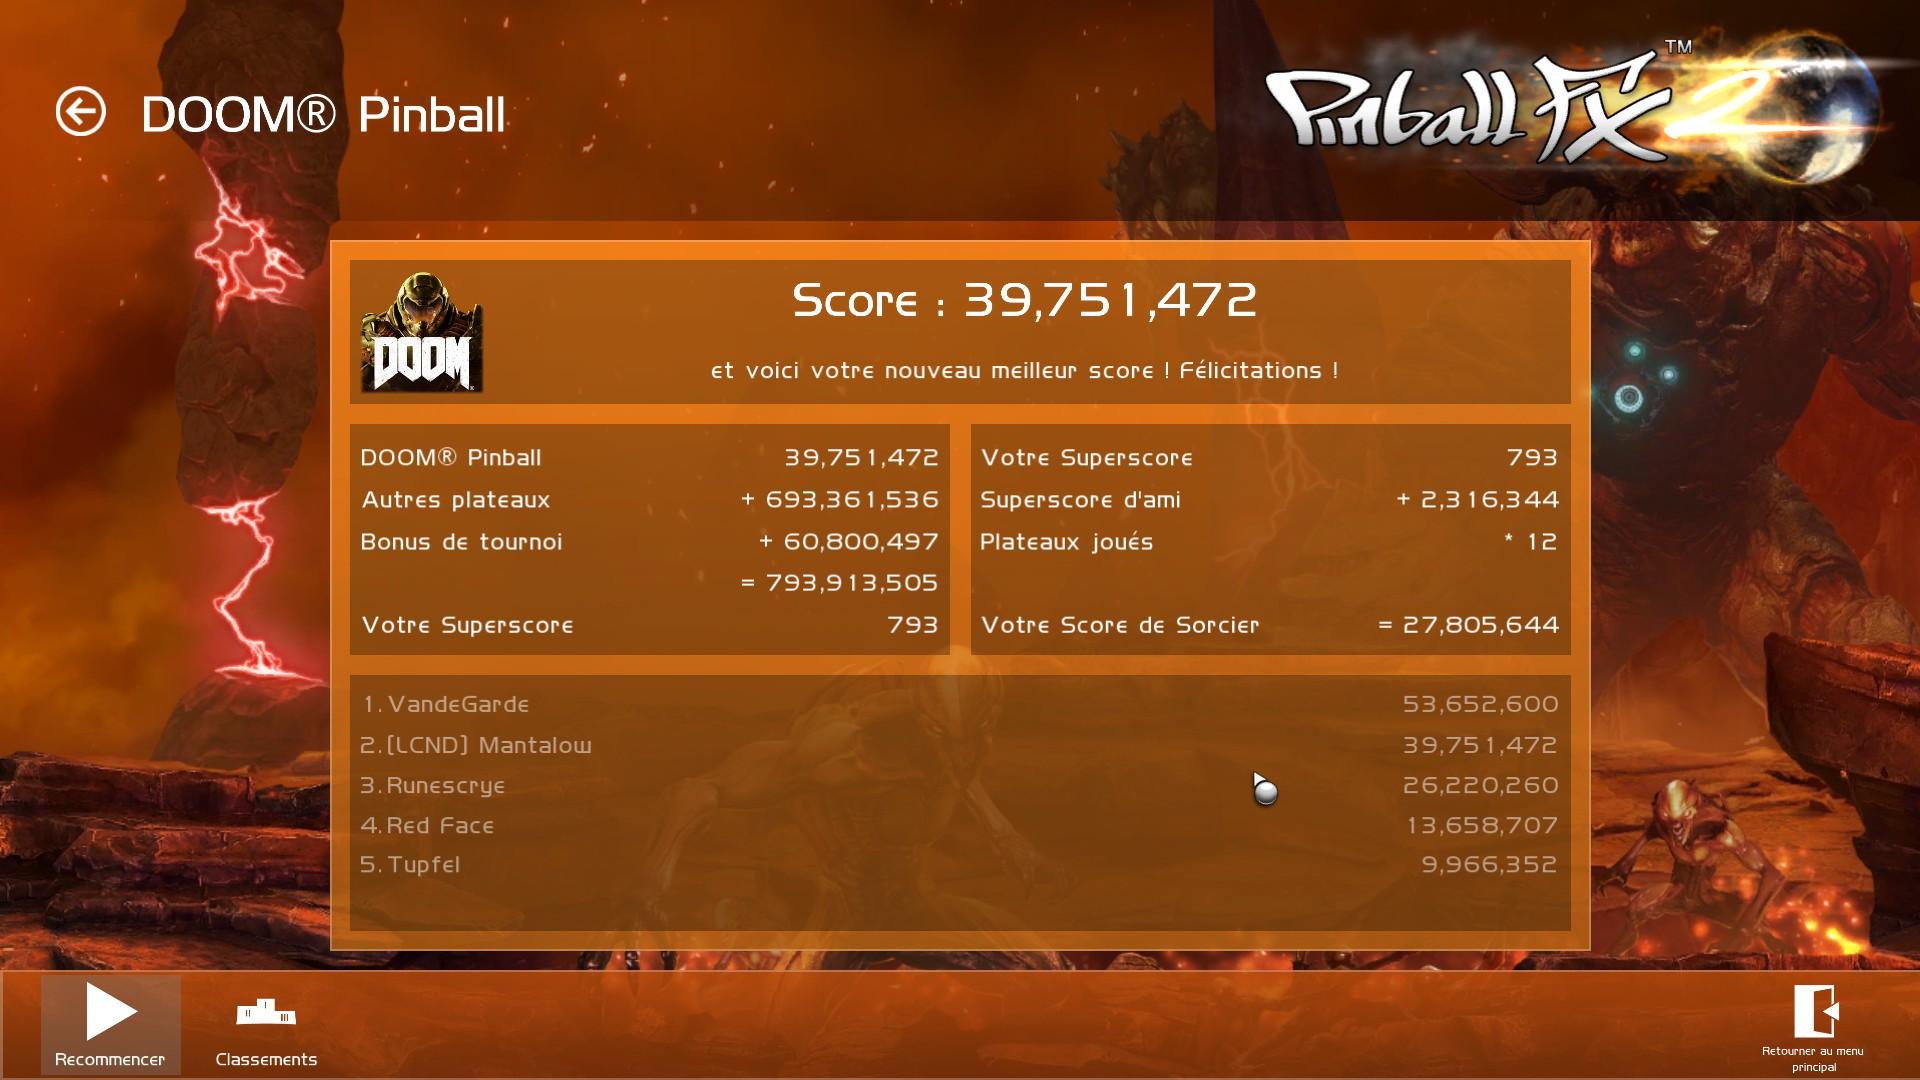 Mantalow: Pinball FX 2: Doom Pinball (PC) 39,751,472 points on 2016-12-08 04:32:51